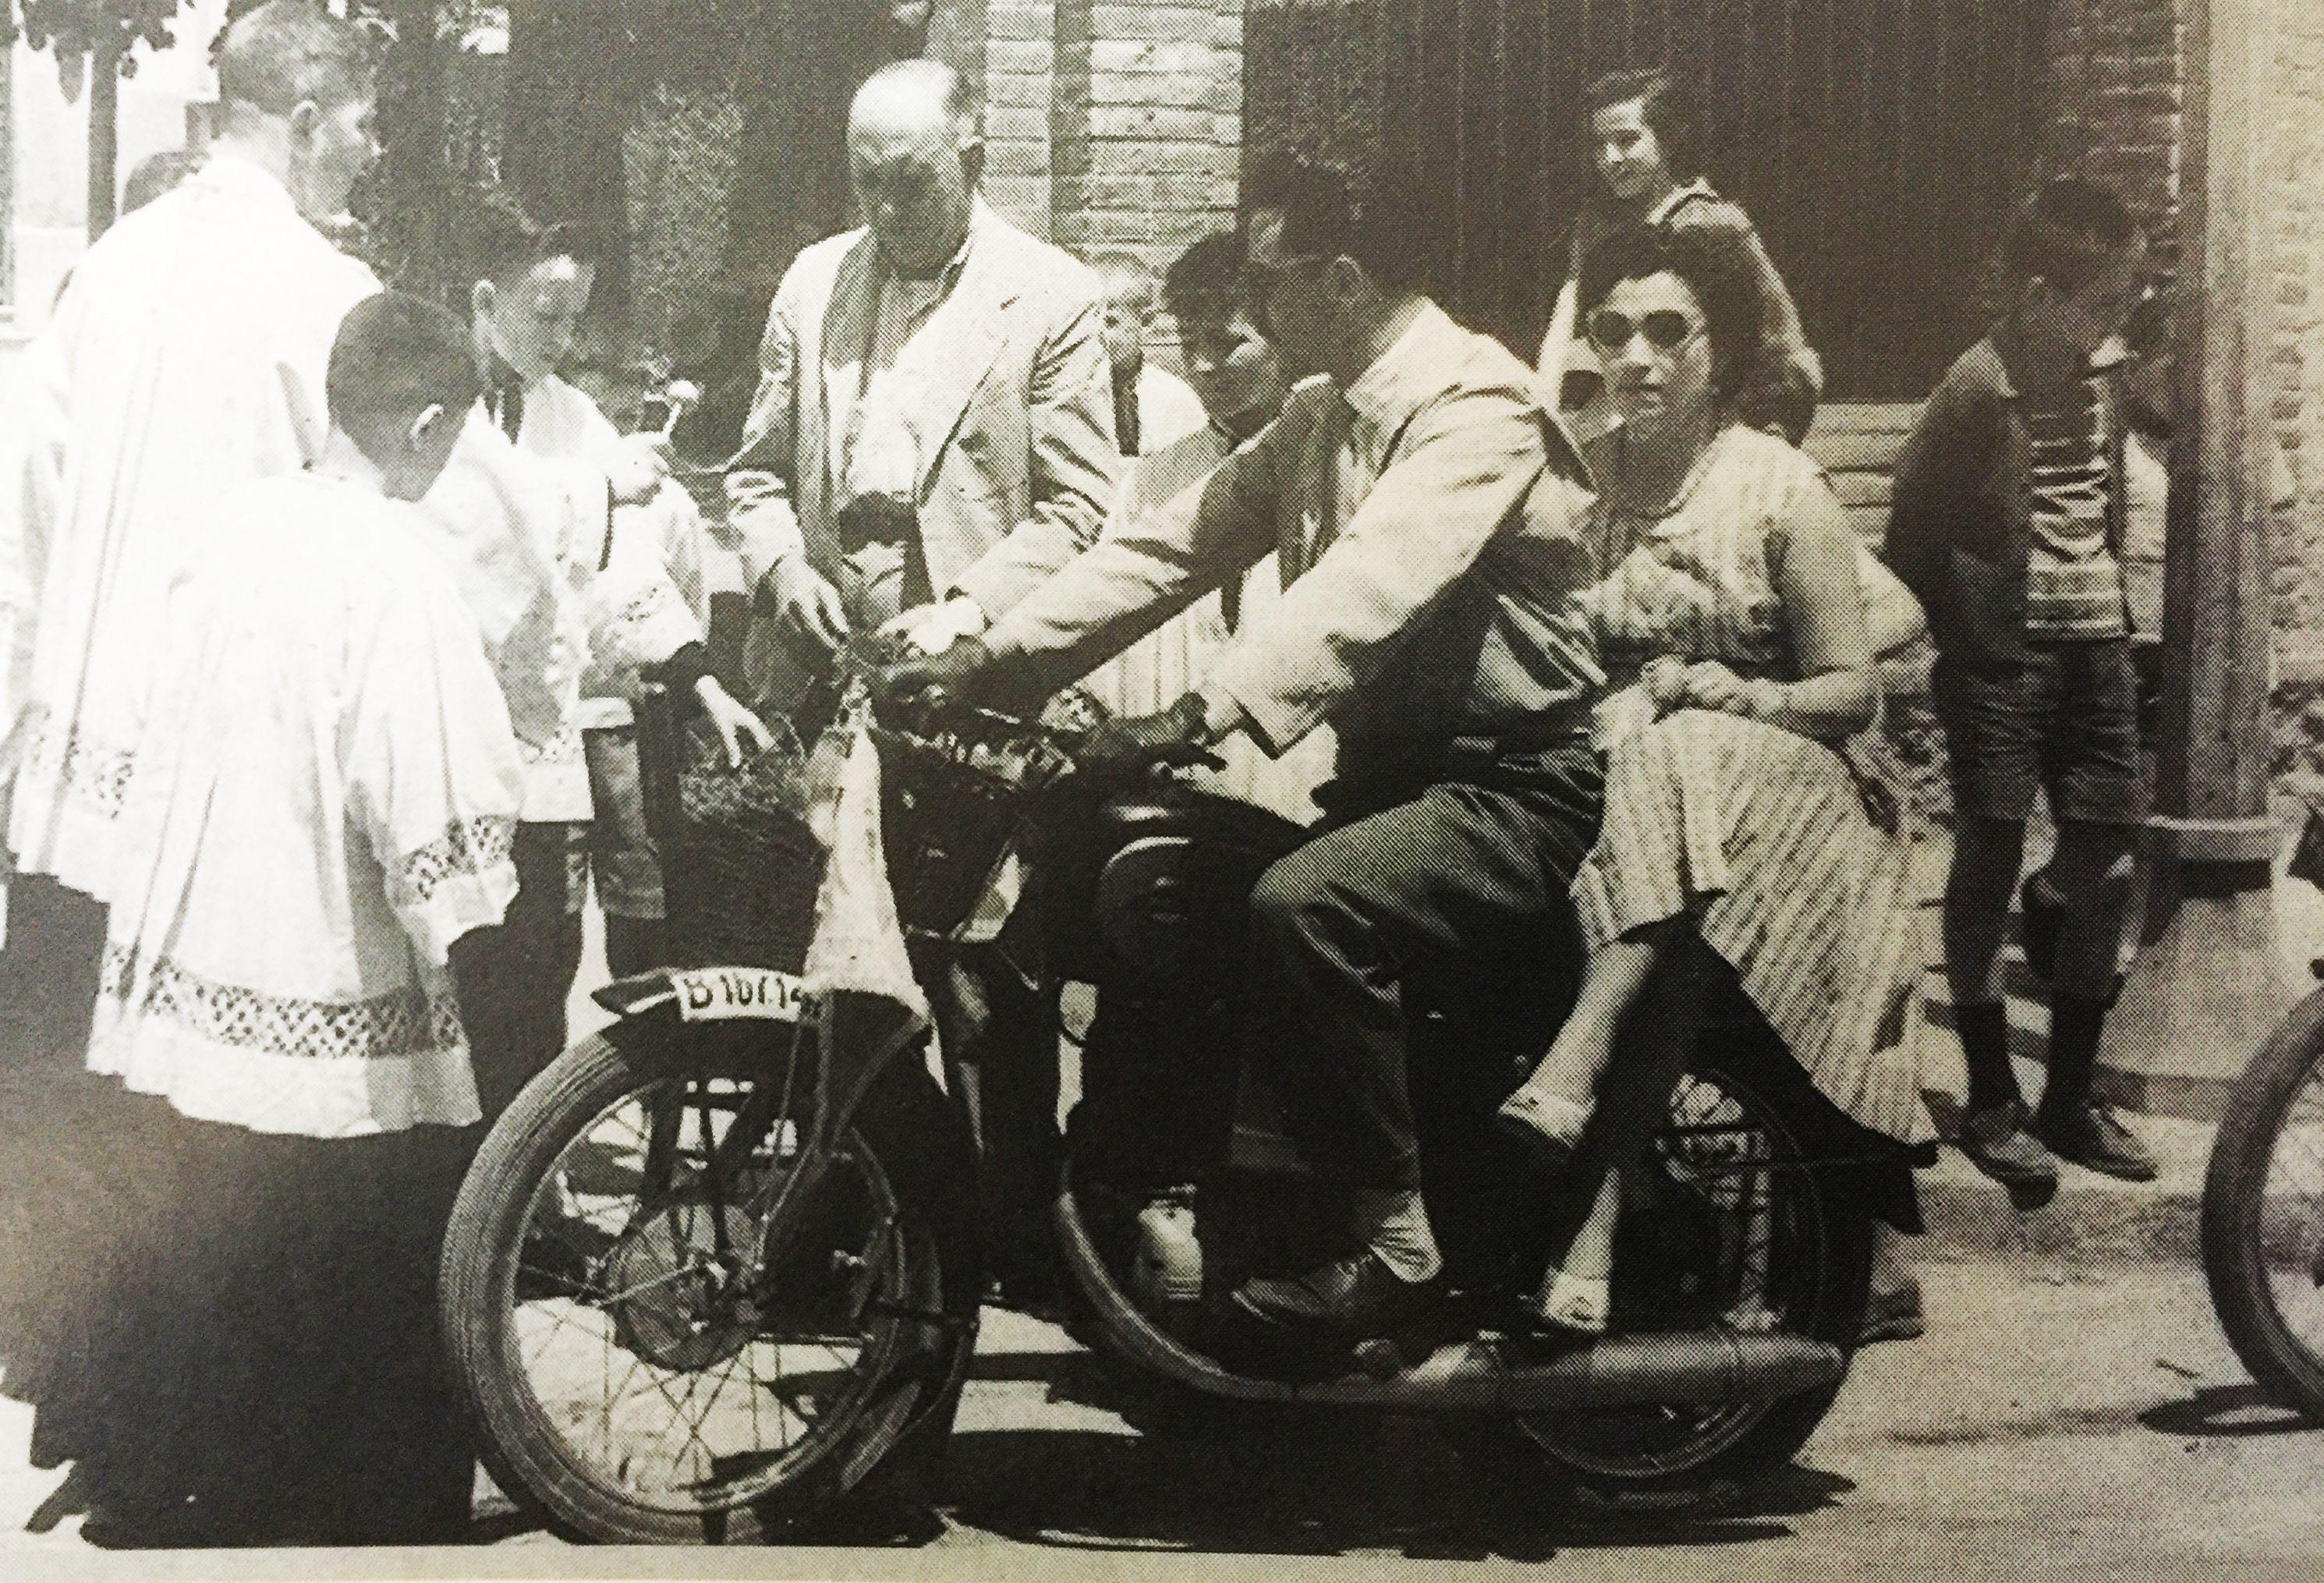 Festivitat de Sant Cristòfol l'any 1959. FOTO: Cedida per la Família Prieto